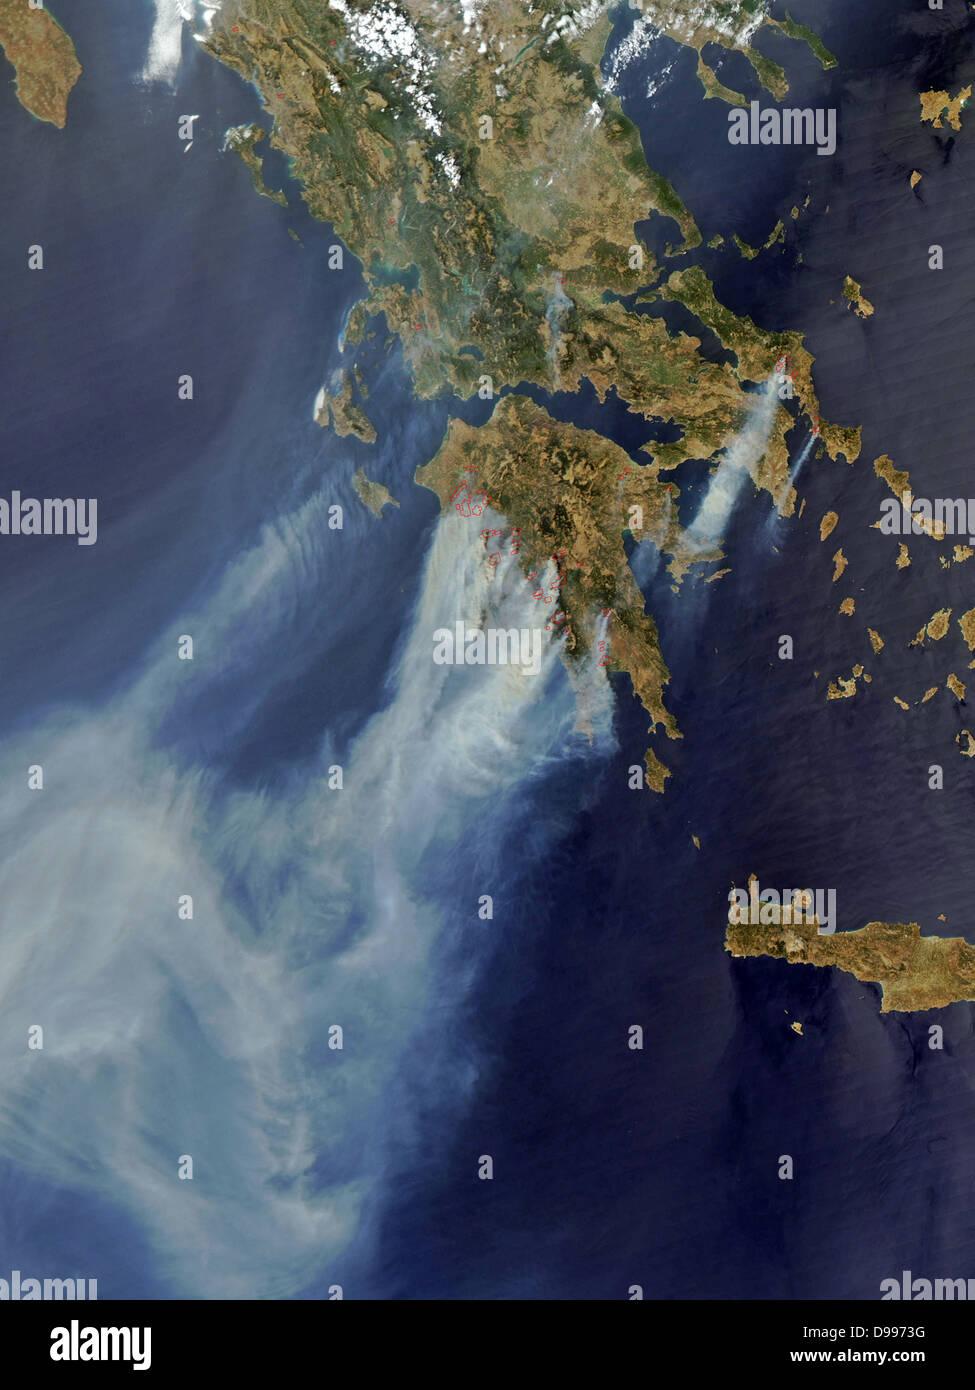 Brände in Griechenland im Sommer 2008. Satellitenbild. Stockbild